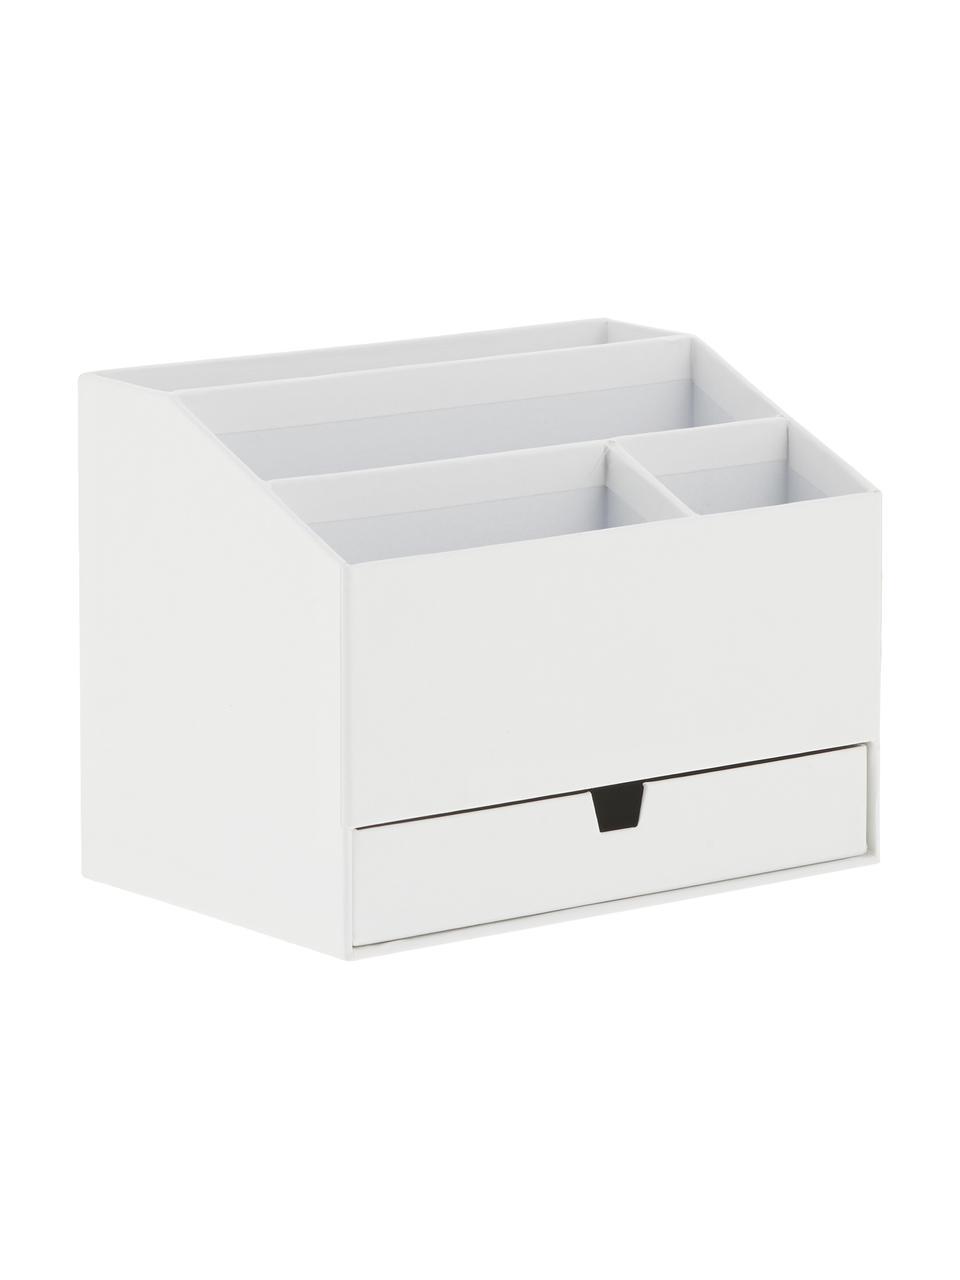 Büro-Organizer Greta, Fester, laminierter Karton, Weiß, 24 x 18 cm